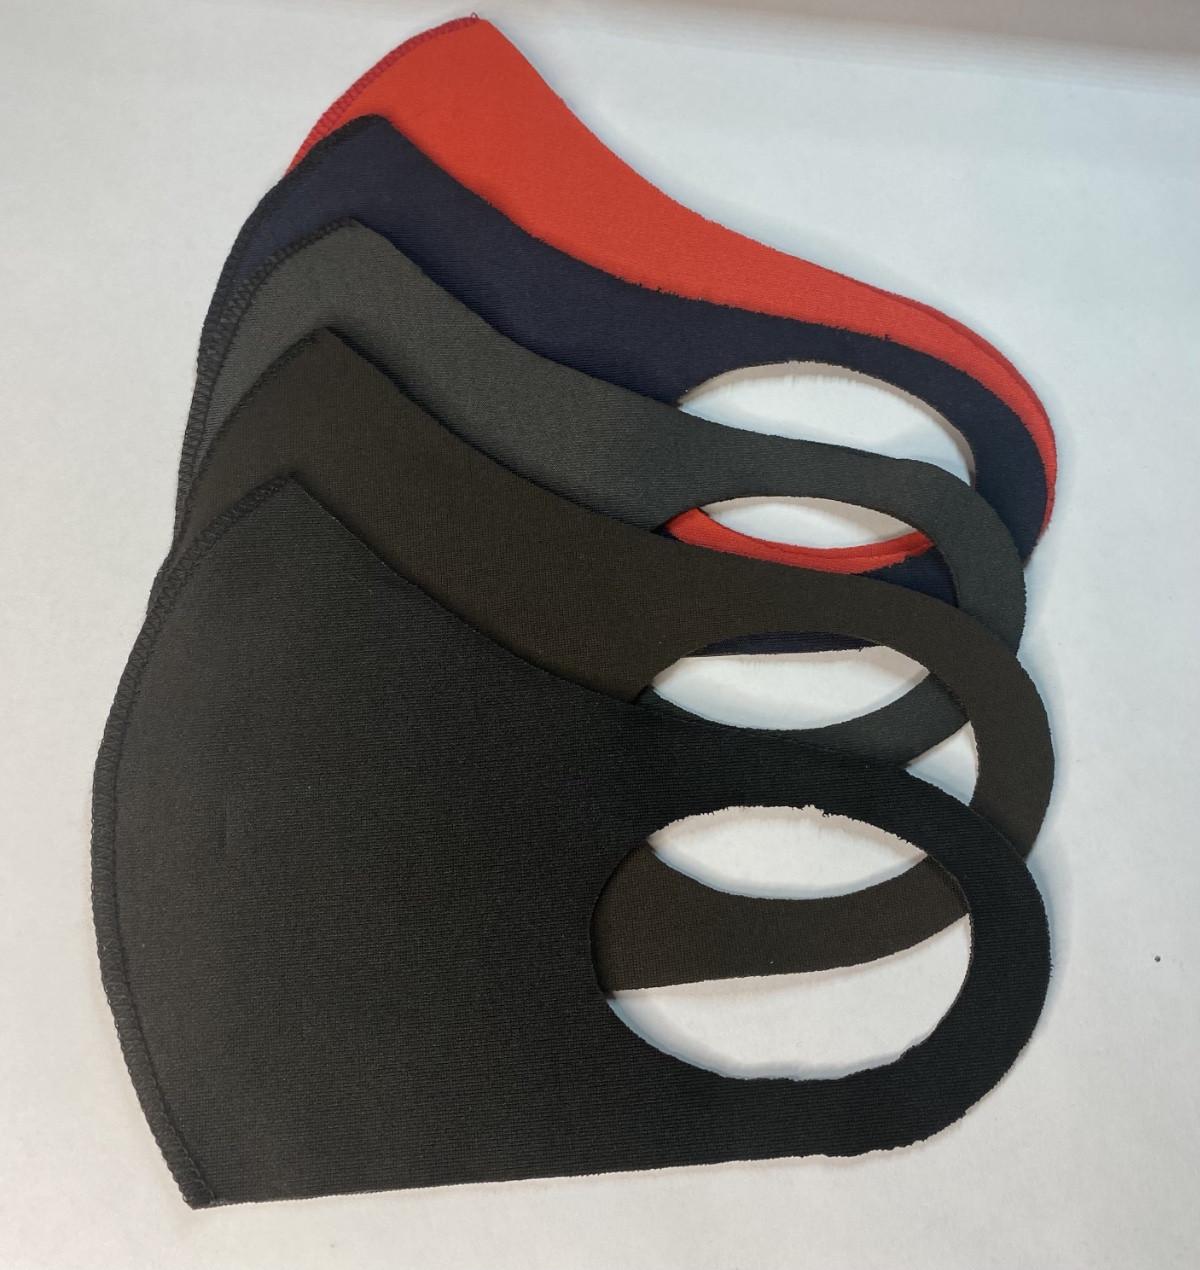 Захисна маска для обличчя не медична неопренова піта пітта Pitta